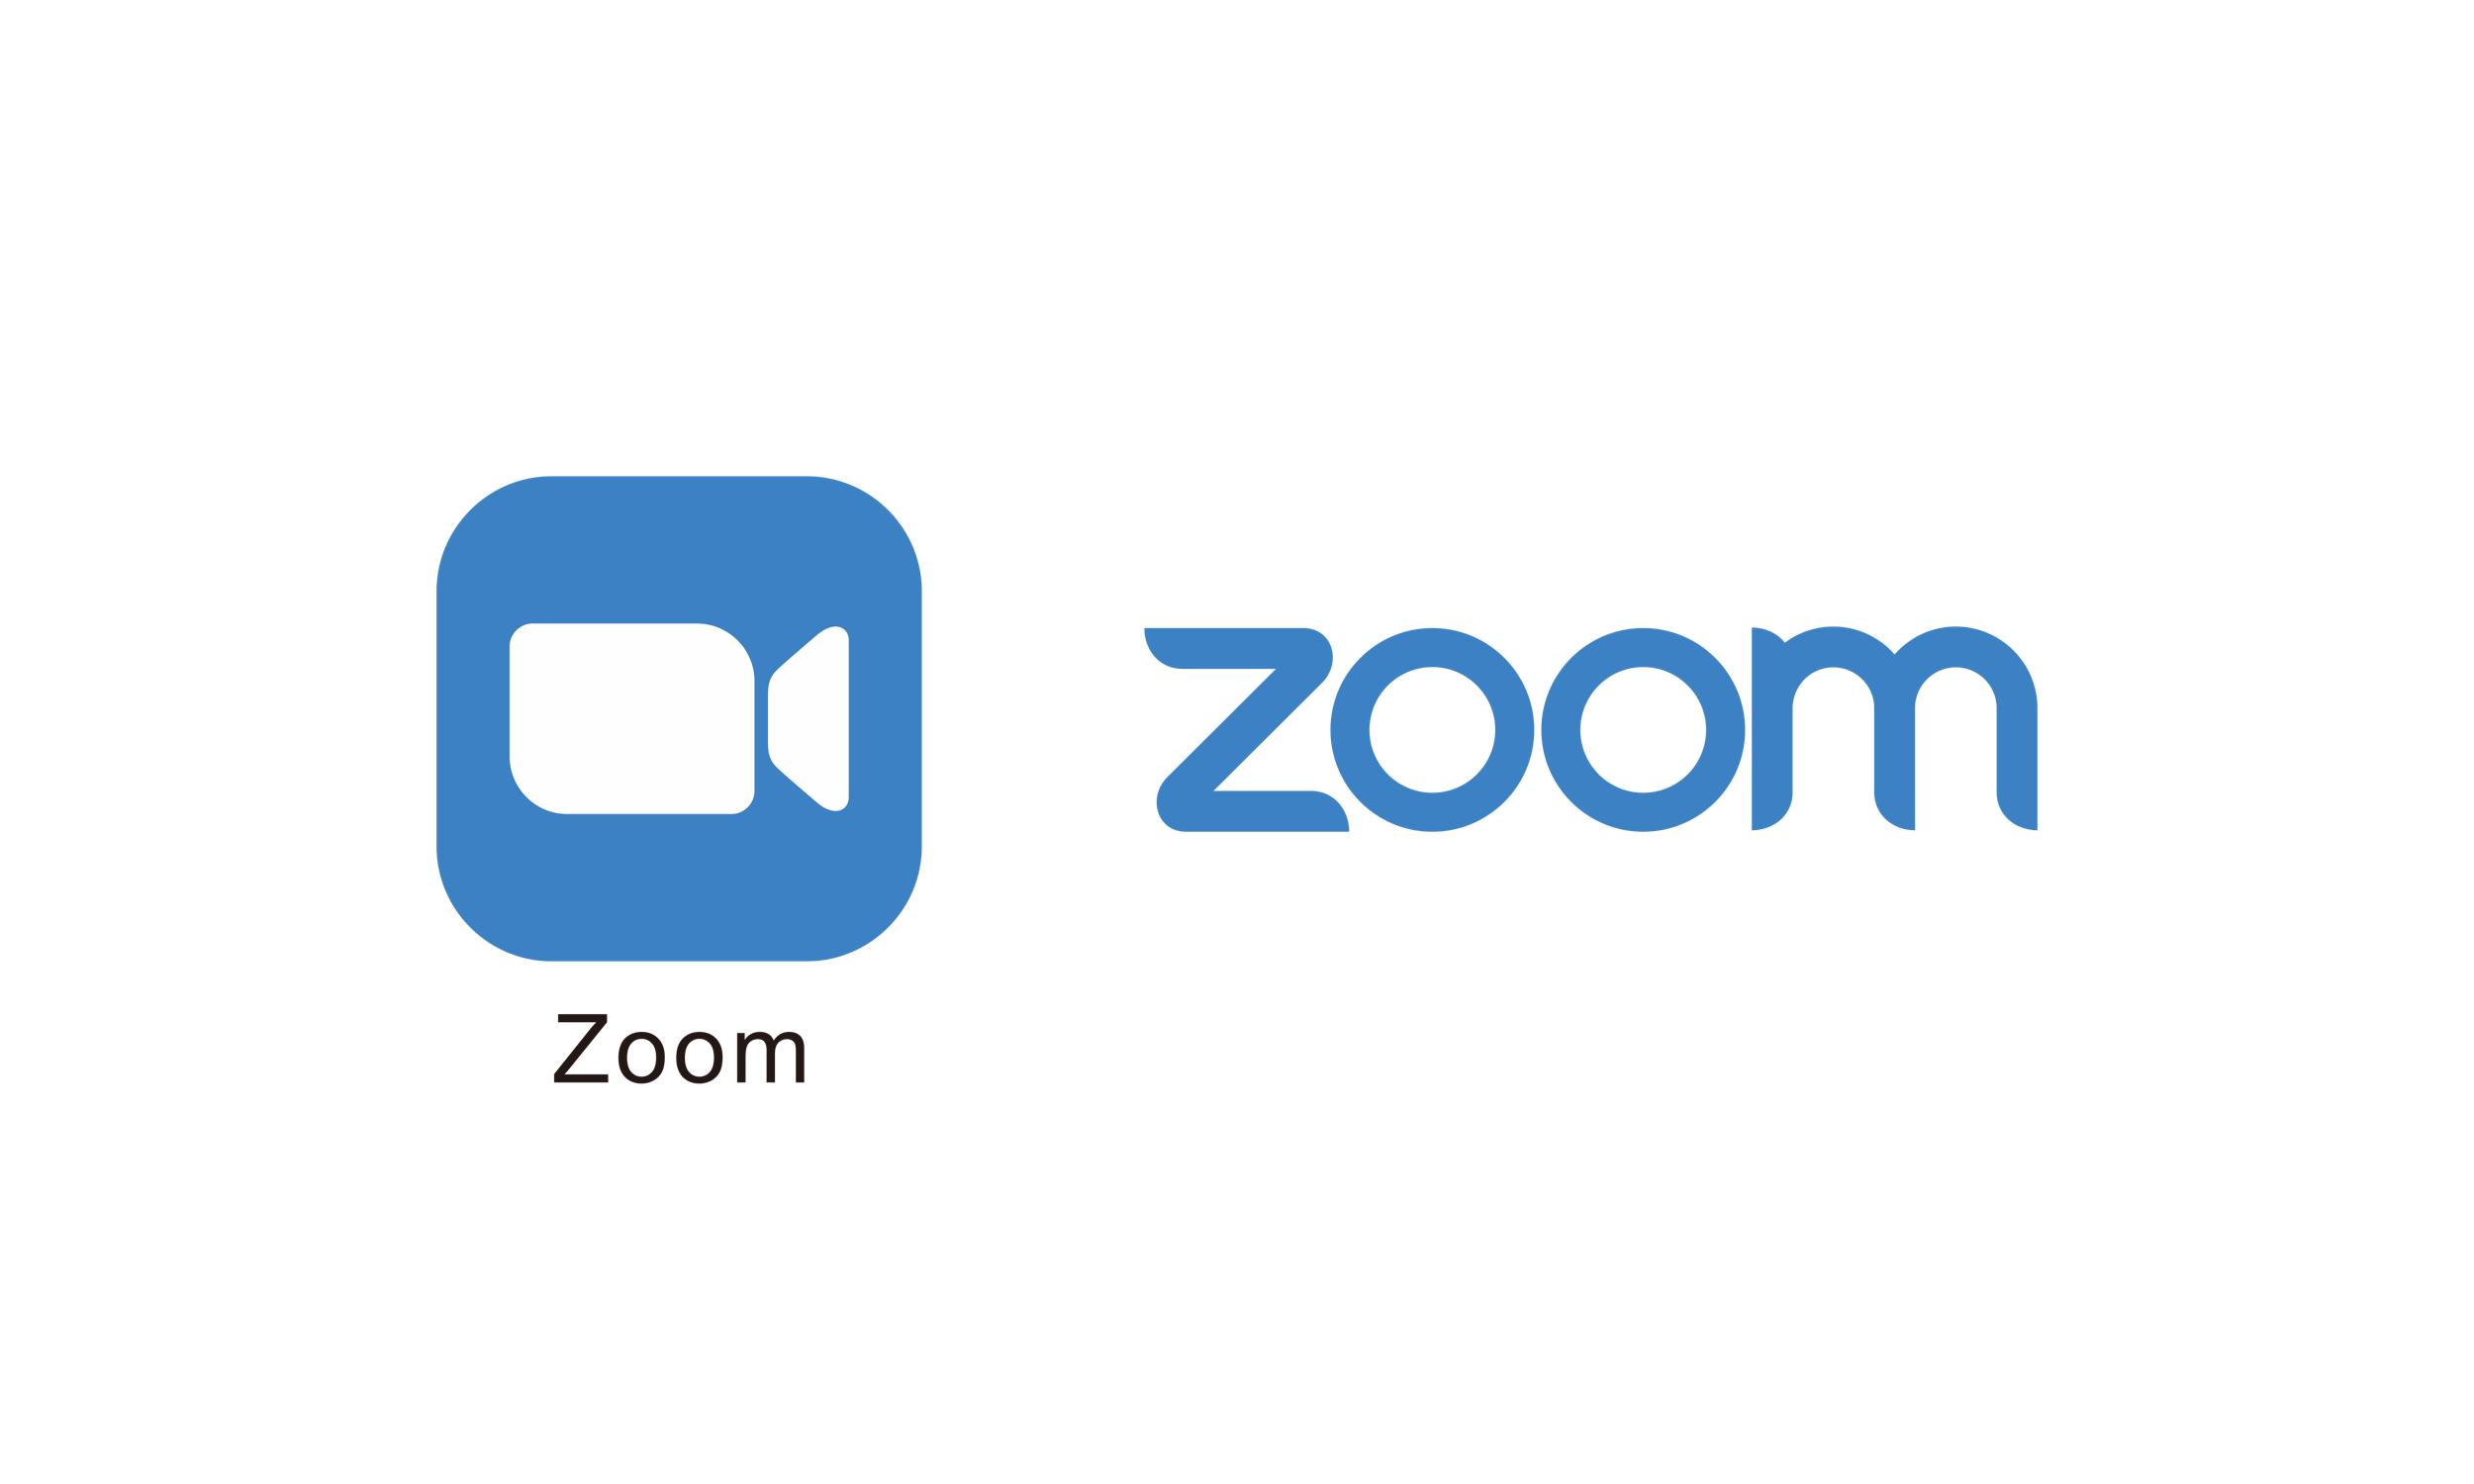 ZOOMロゴマーク